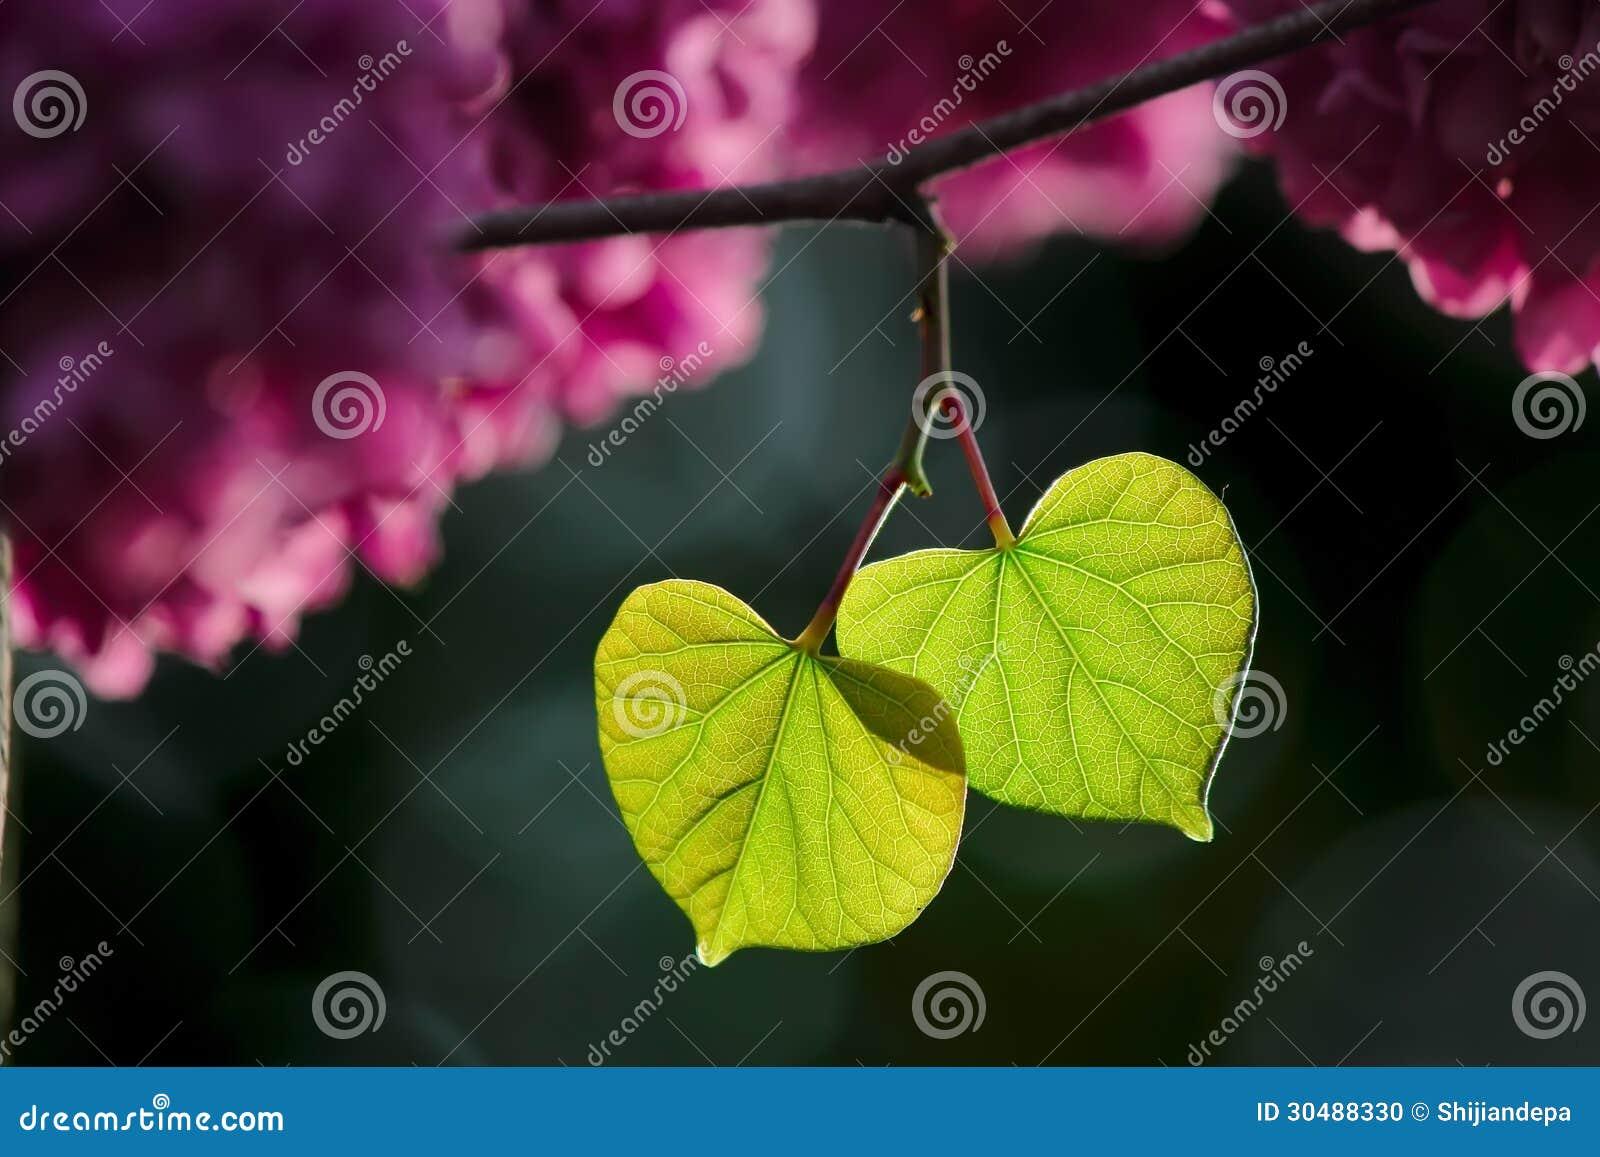 Ami le foglie verdi